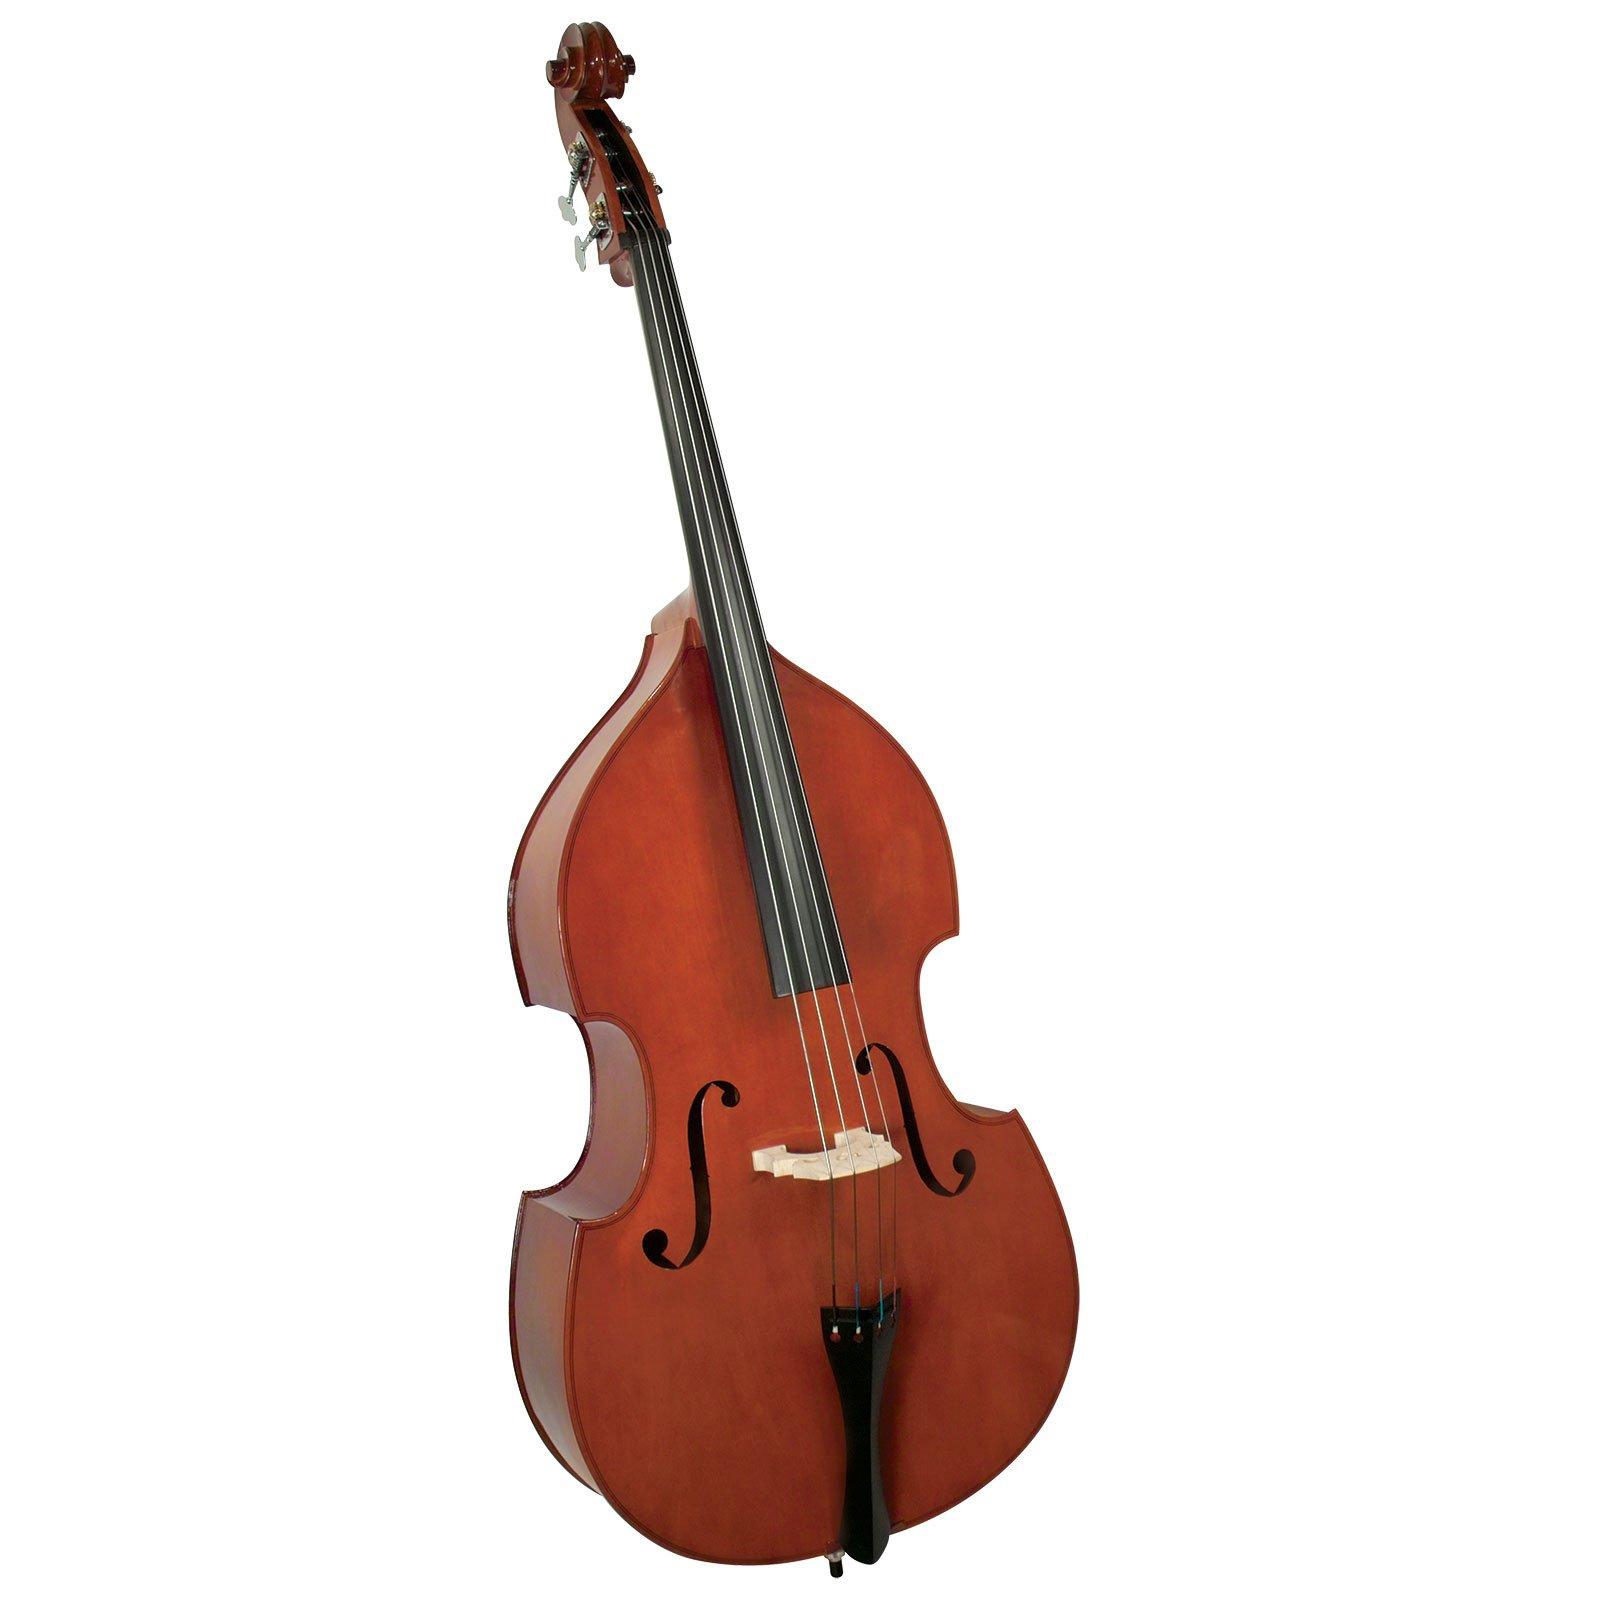 Cervini HB-100 Beginner Bass Outfit - 1/2 Size by Cervini